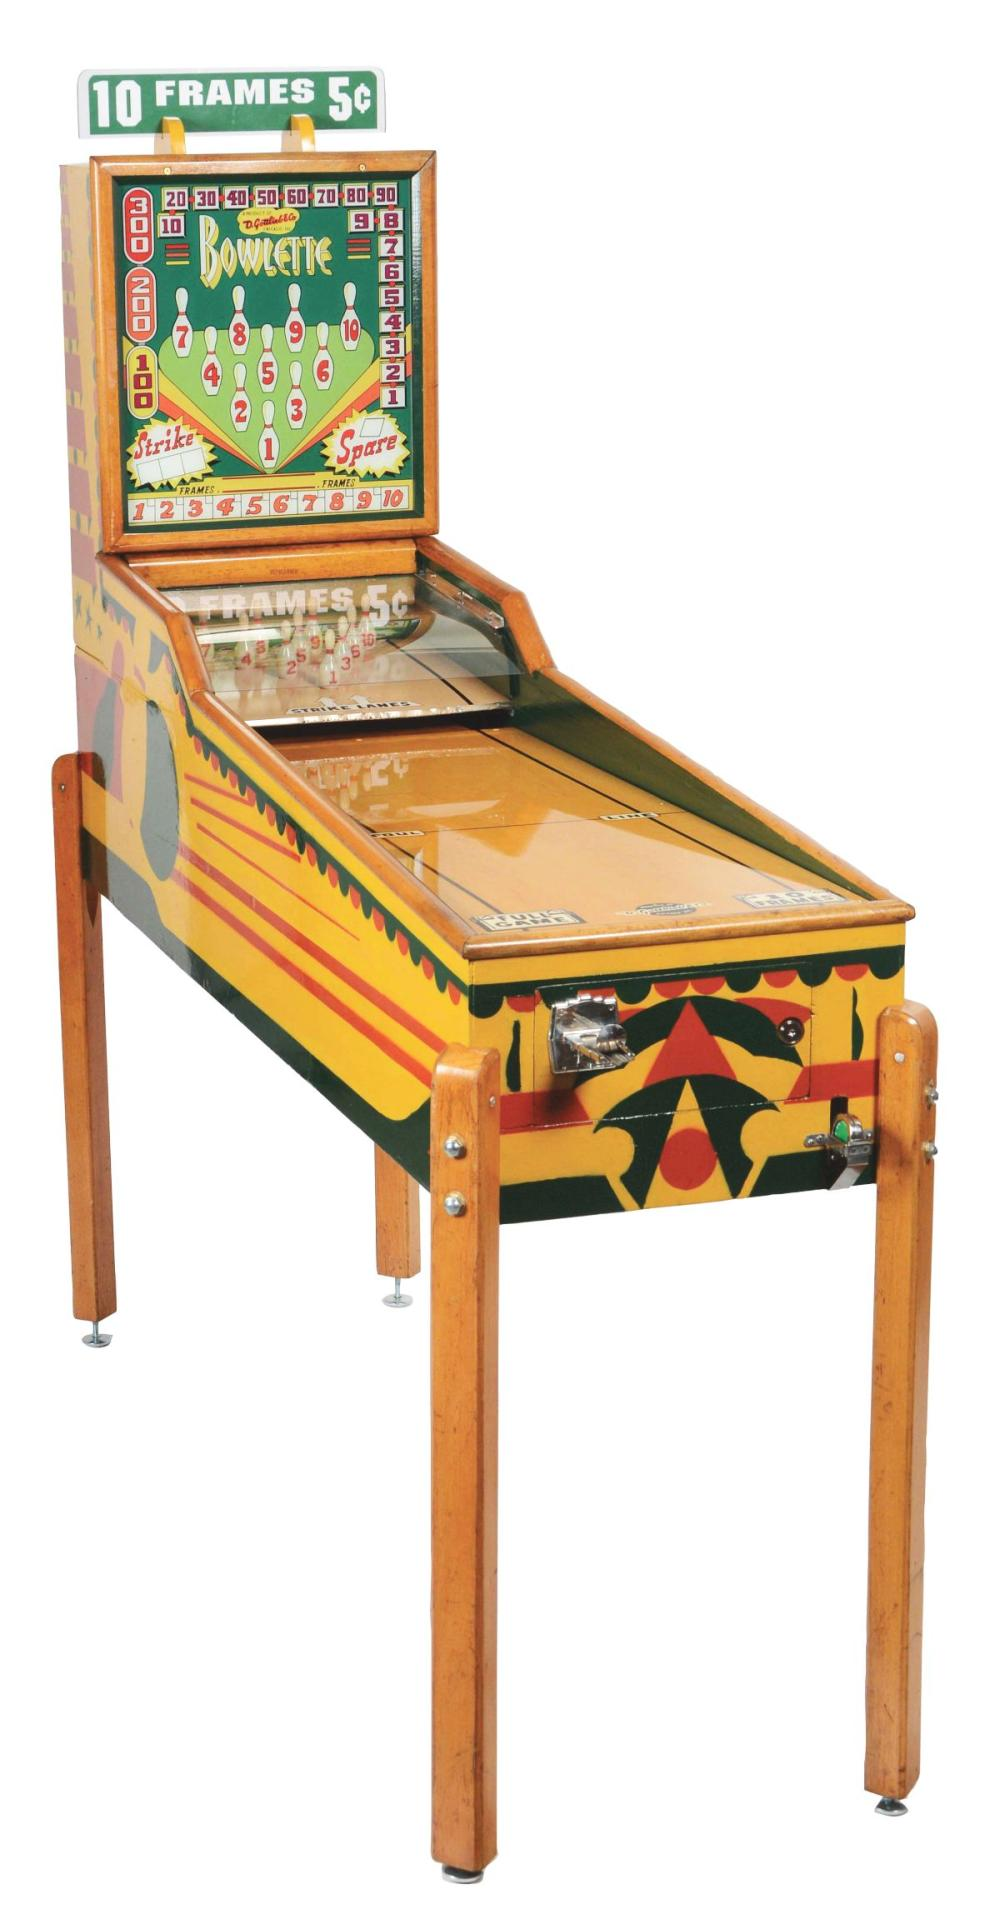 5¢ GOTTLIEB & CO. BOWLETTE BOWLING ARCADE GAME.